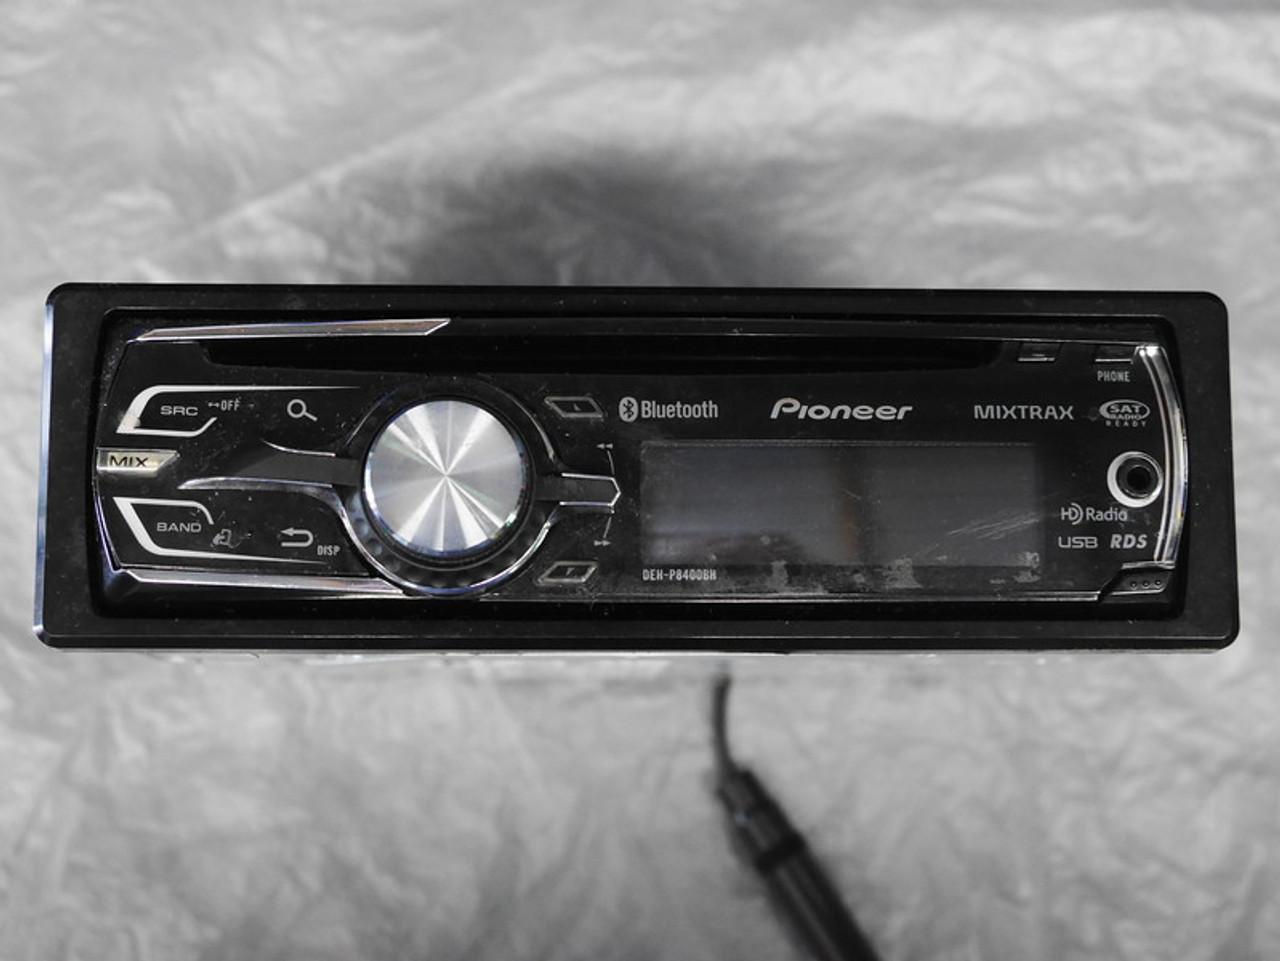 pioneer mixtrax car audio wire harness deh 8400bh wiring diagram used pioneer mixtrax car audio wire [ 1280 x 961 Pixel ]